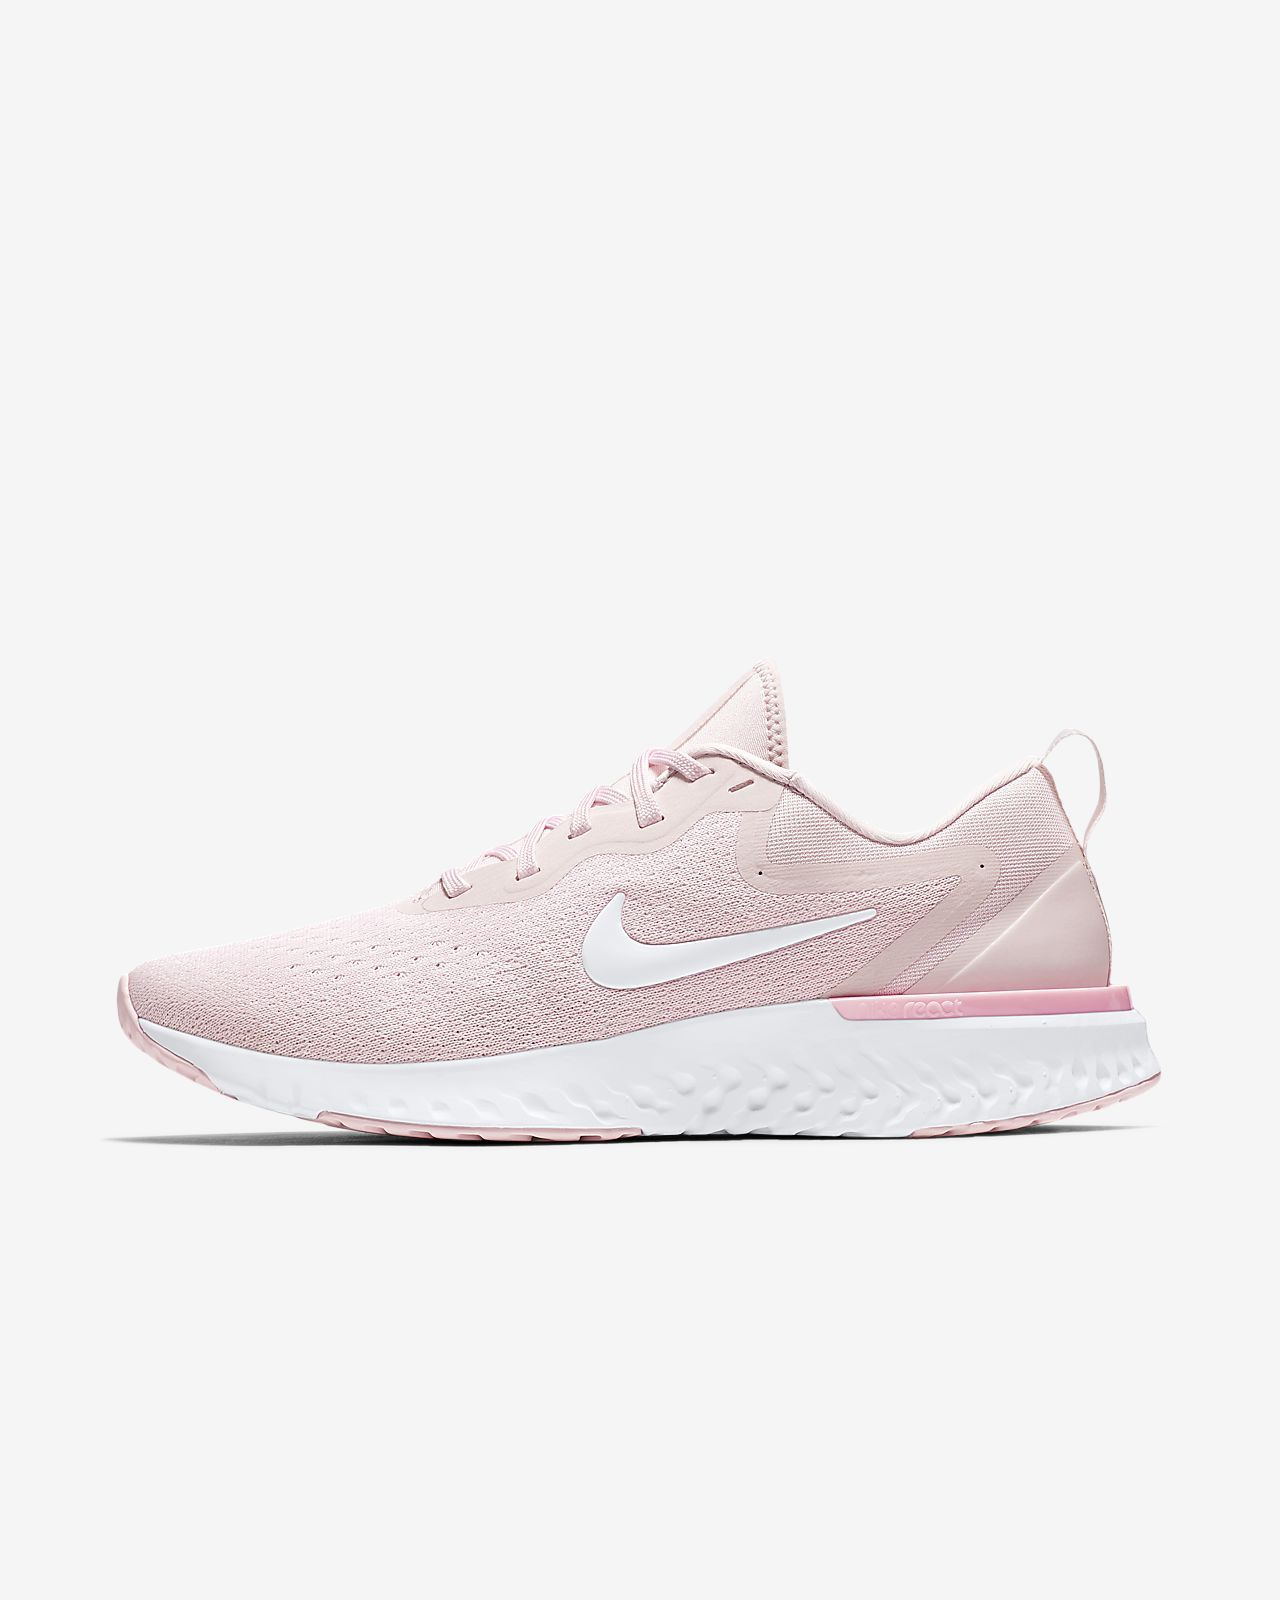 556116bf26bd Nike Odyssey React Women s Running Shoe